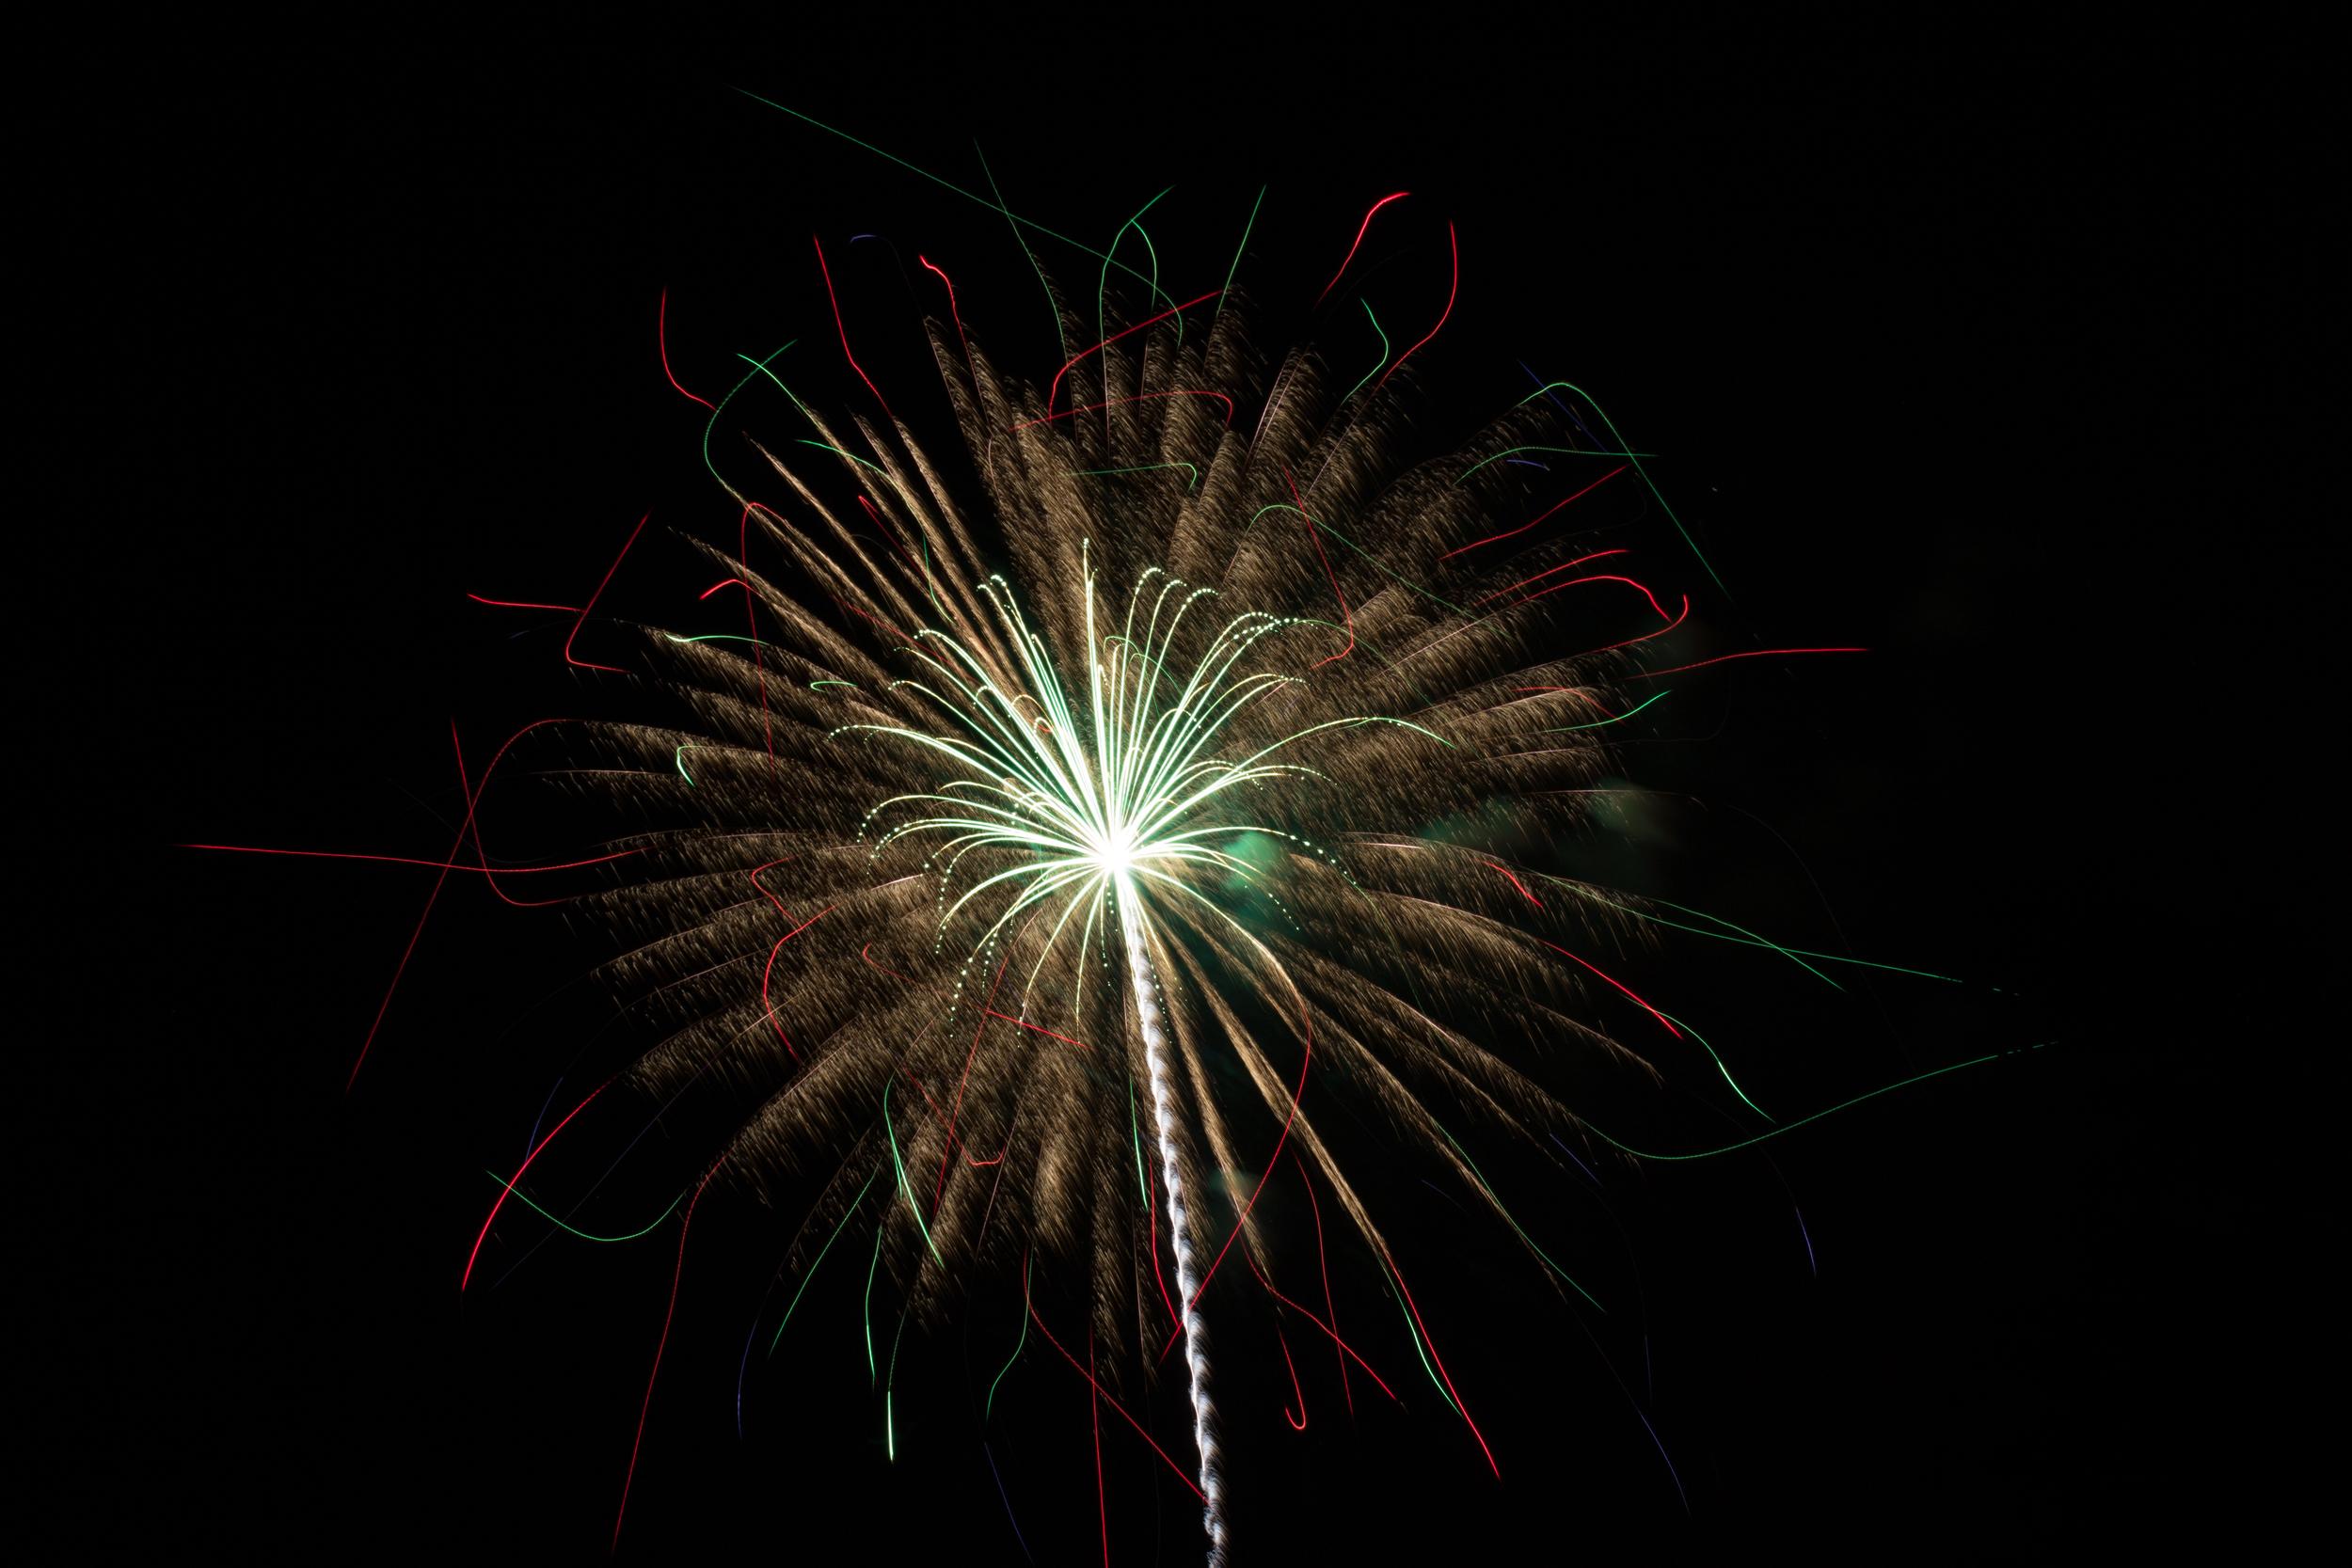 Anthem_Fireworks_squiggles